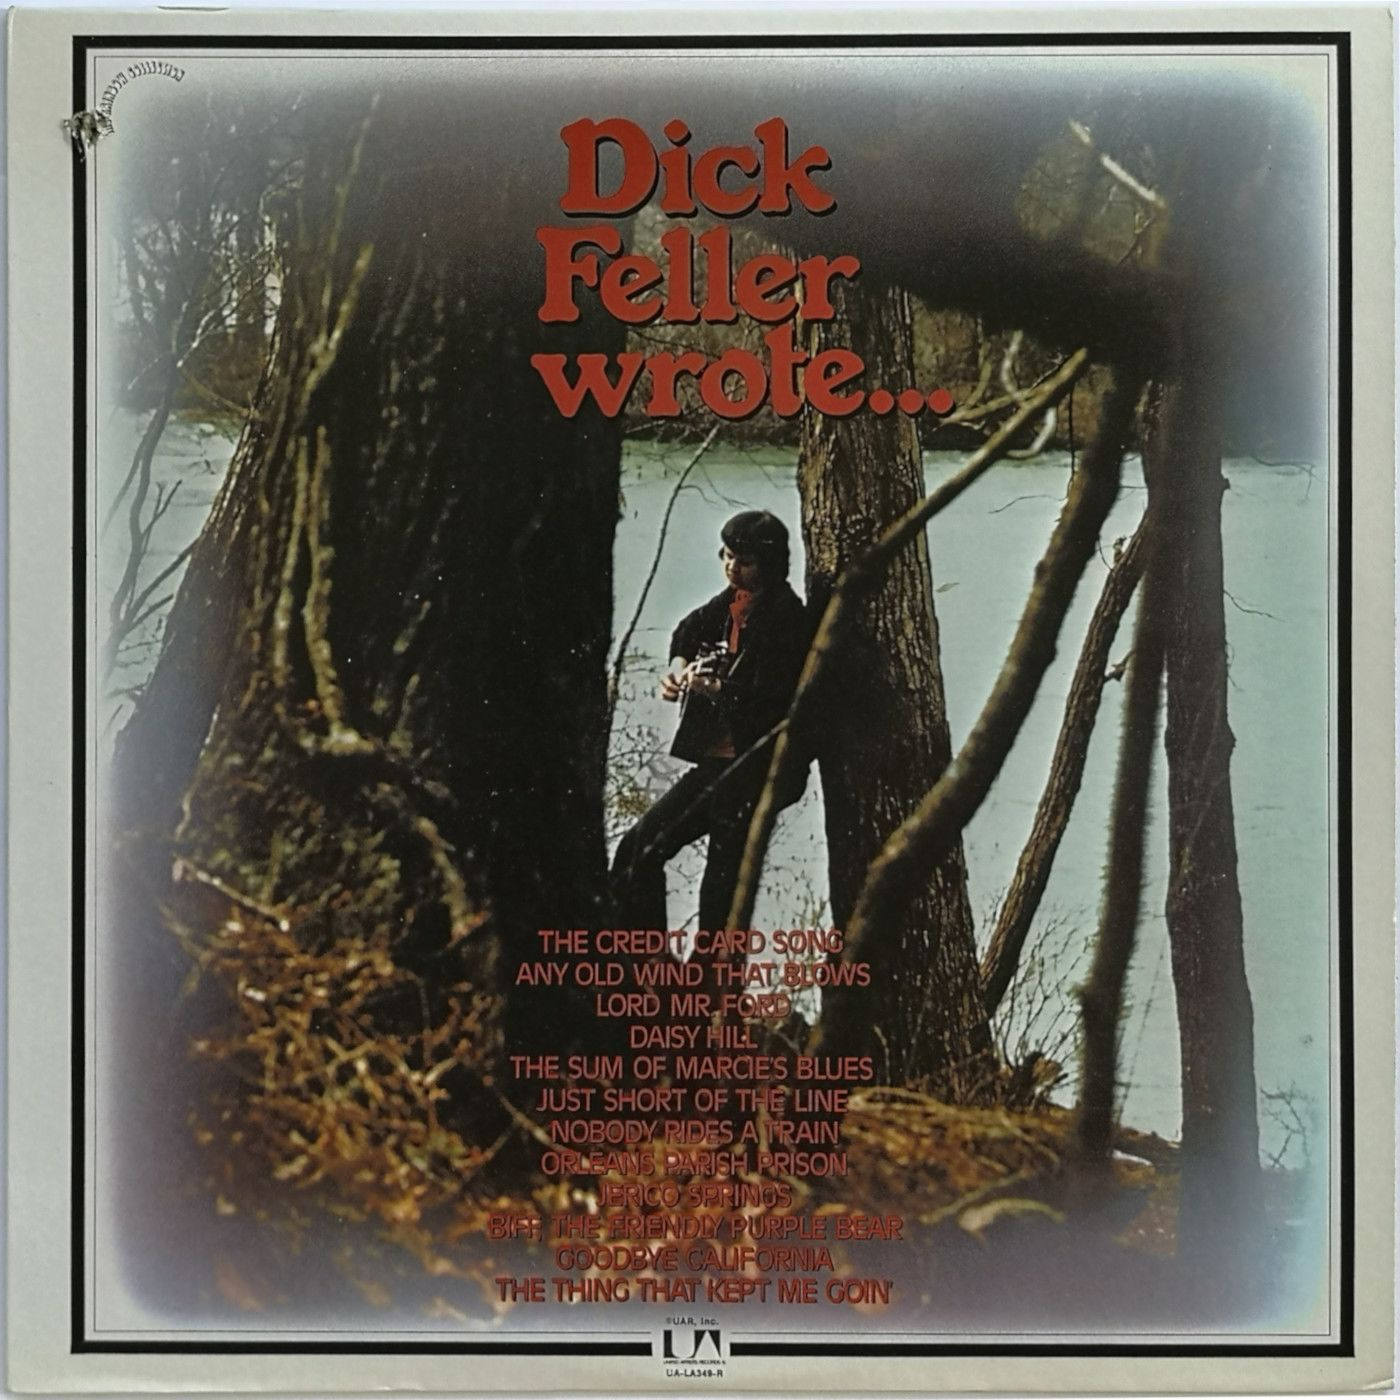 Dick Feller Dick Feller Wrote... LP undefined